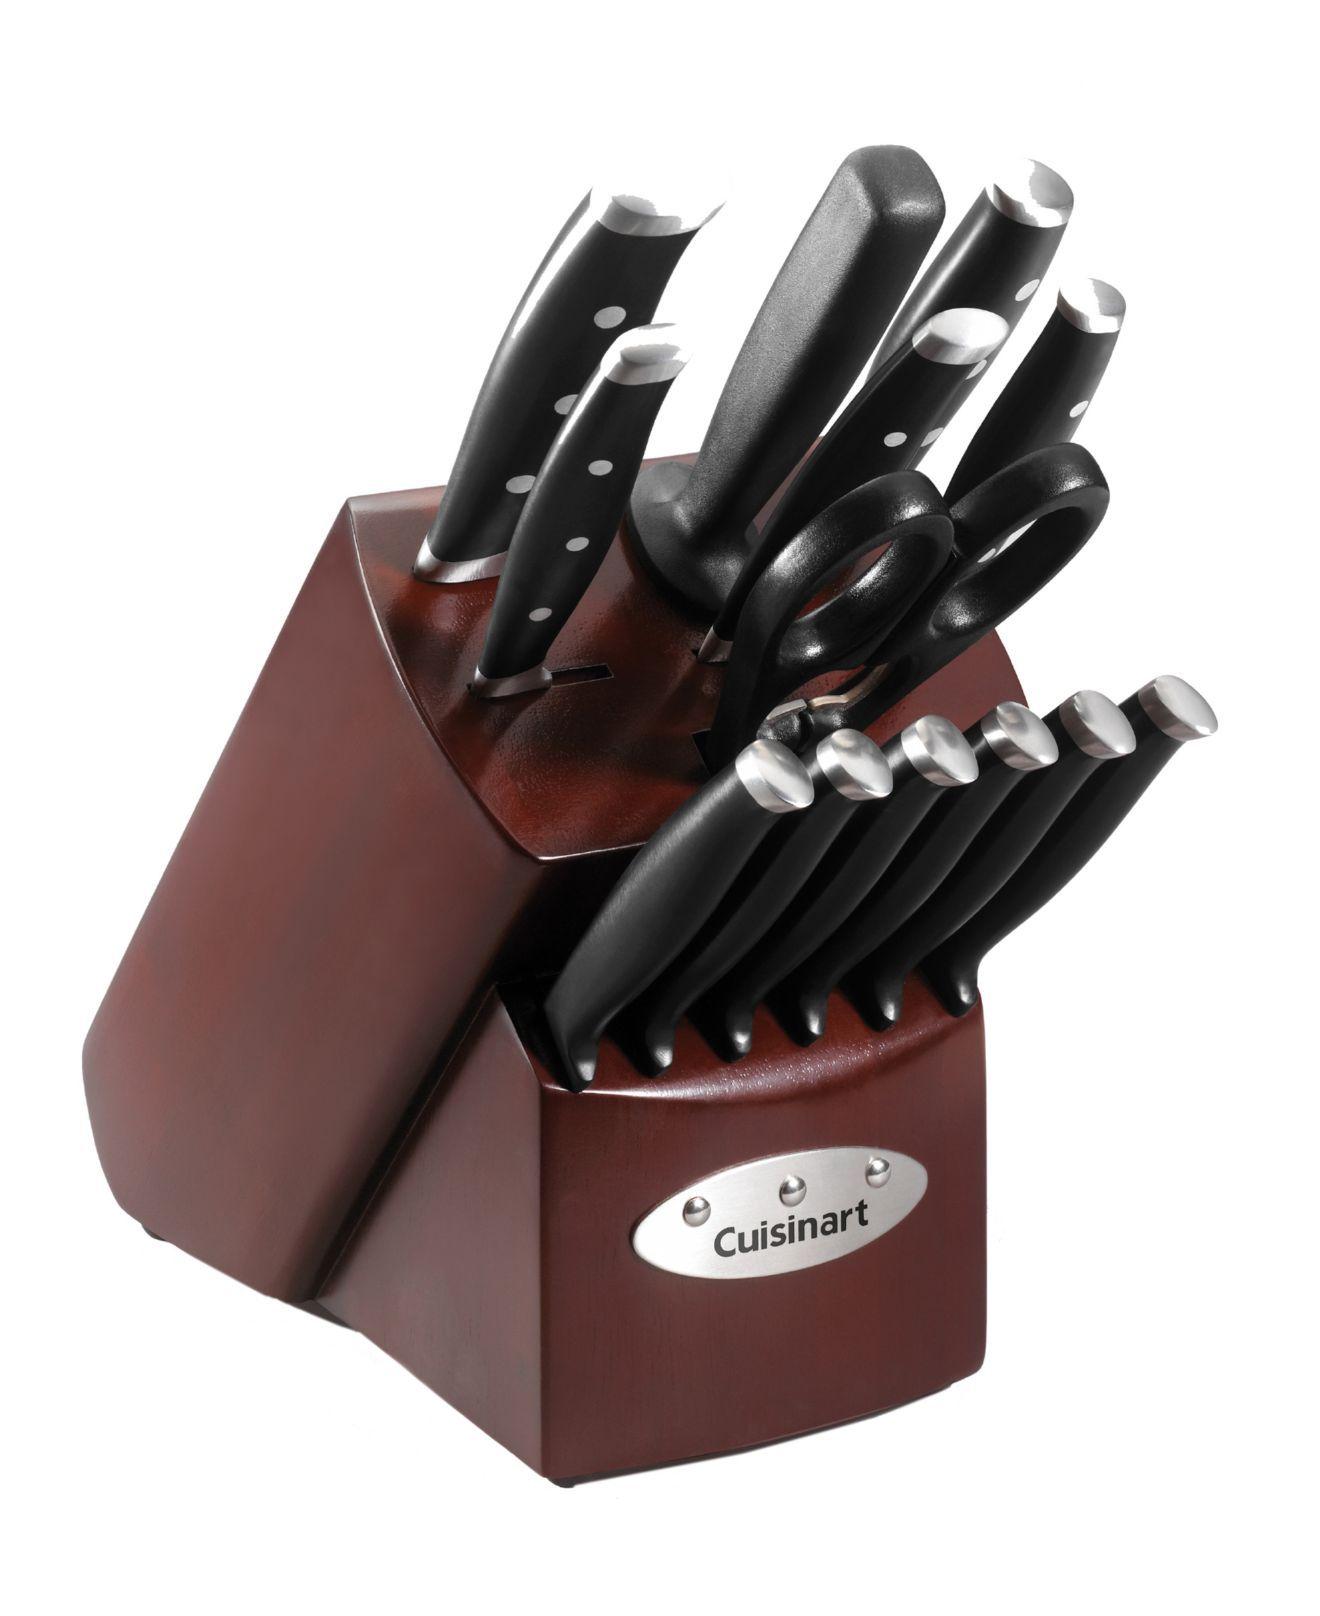 Cuisinart Cutlery Set 14 Piece Triple Riveted In Cherry Block Cutlery Knives Kitchen Macy S Cutlery Set Cuisinart Knife Block Set